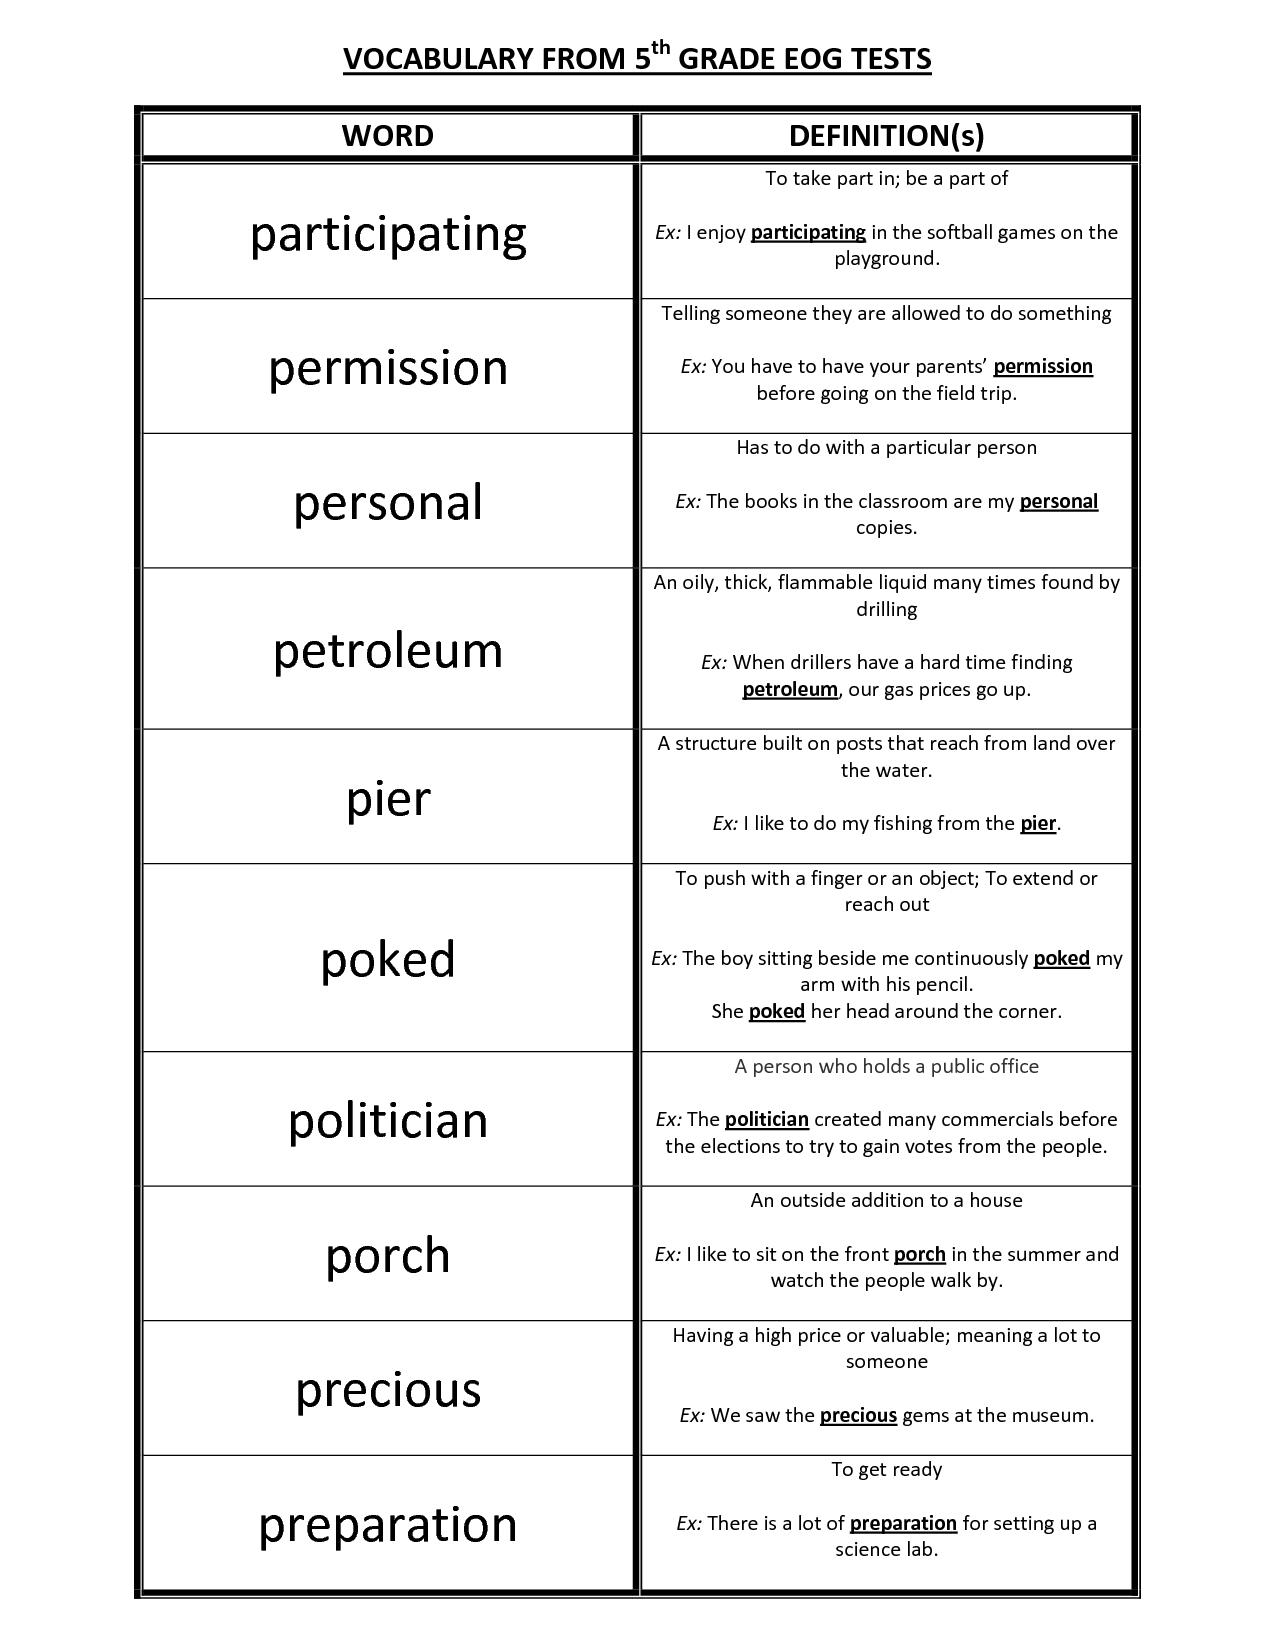 5th Grade Math Vocabulary Quizlet Quizlet 3rd Grade Math Vocabulary 5th Fractions Words Staar [ 1650 x 1275 Pixel ]